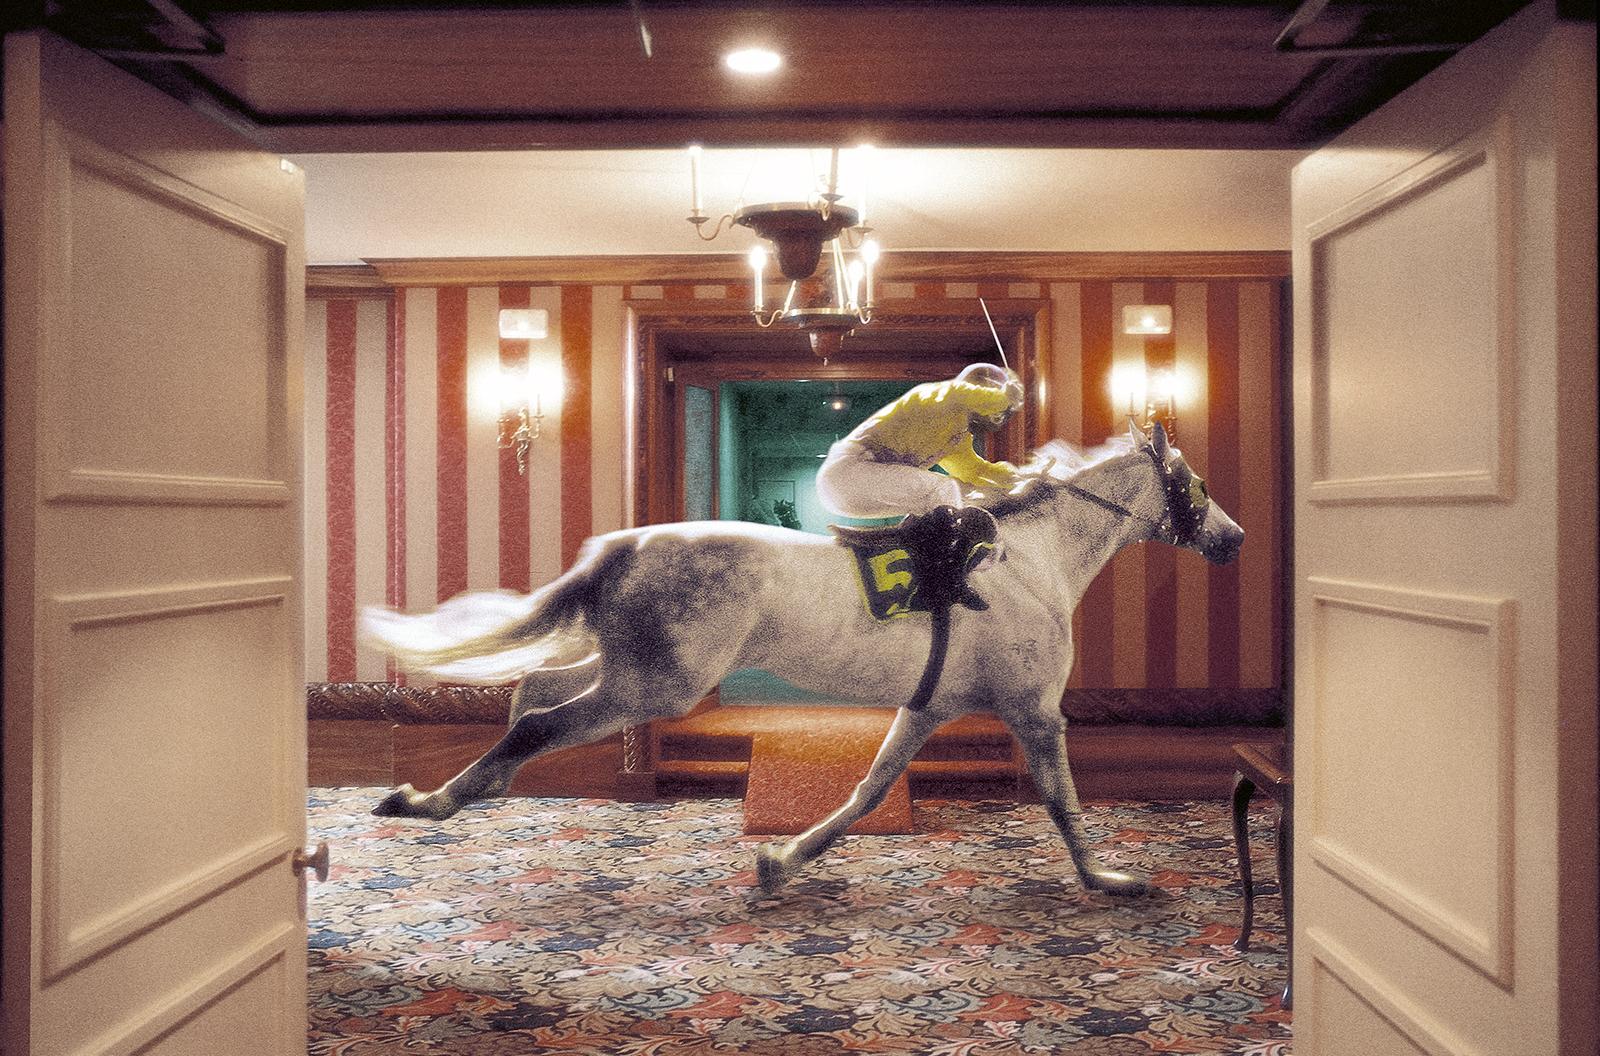 Pferd_neu_ohne_korn.jpg